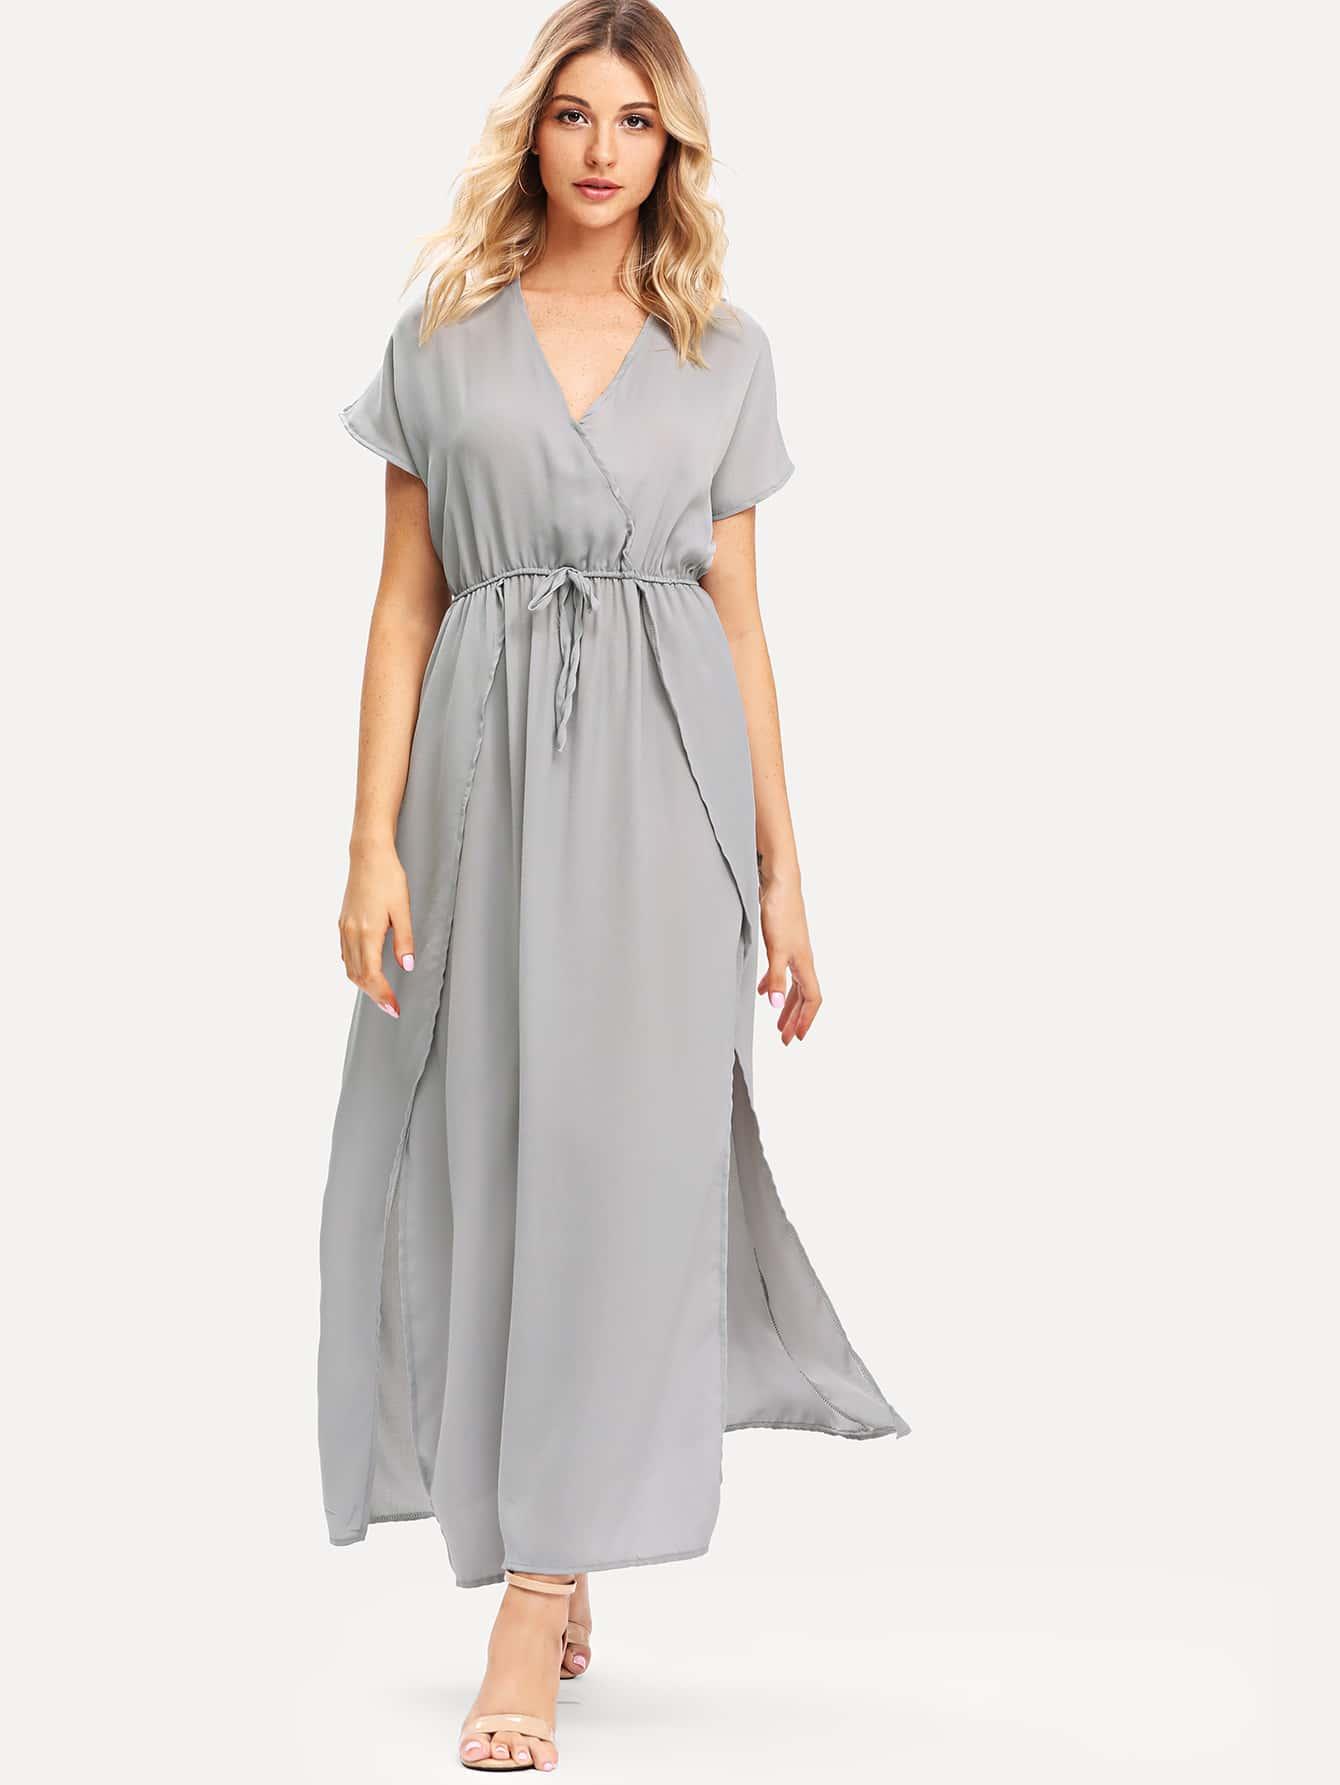 Drawstring Waist Wrap Dress drawstring waist tank dress